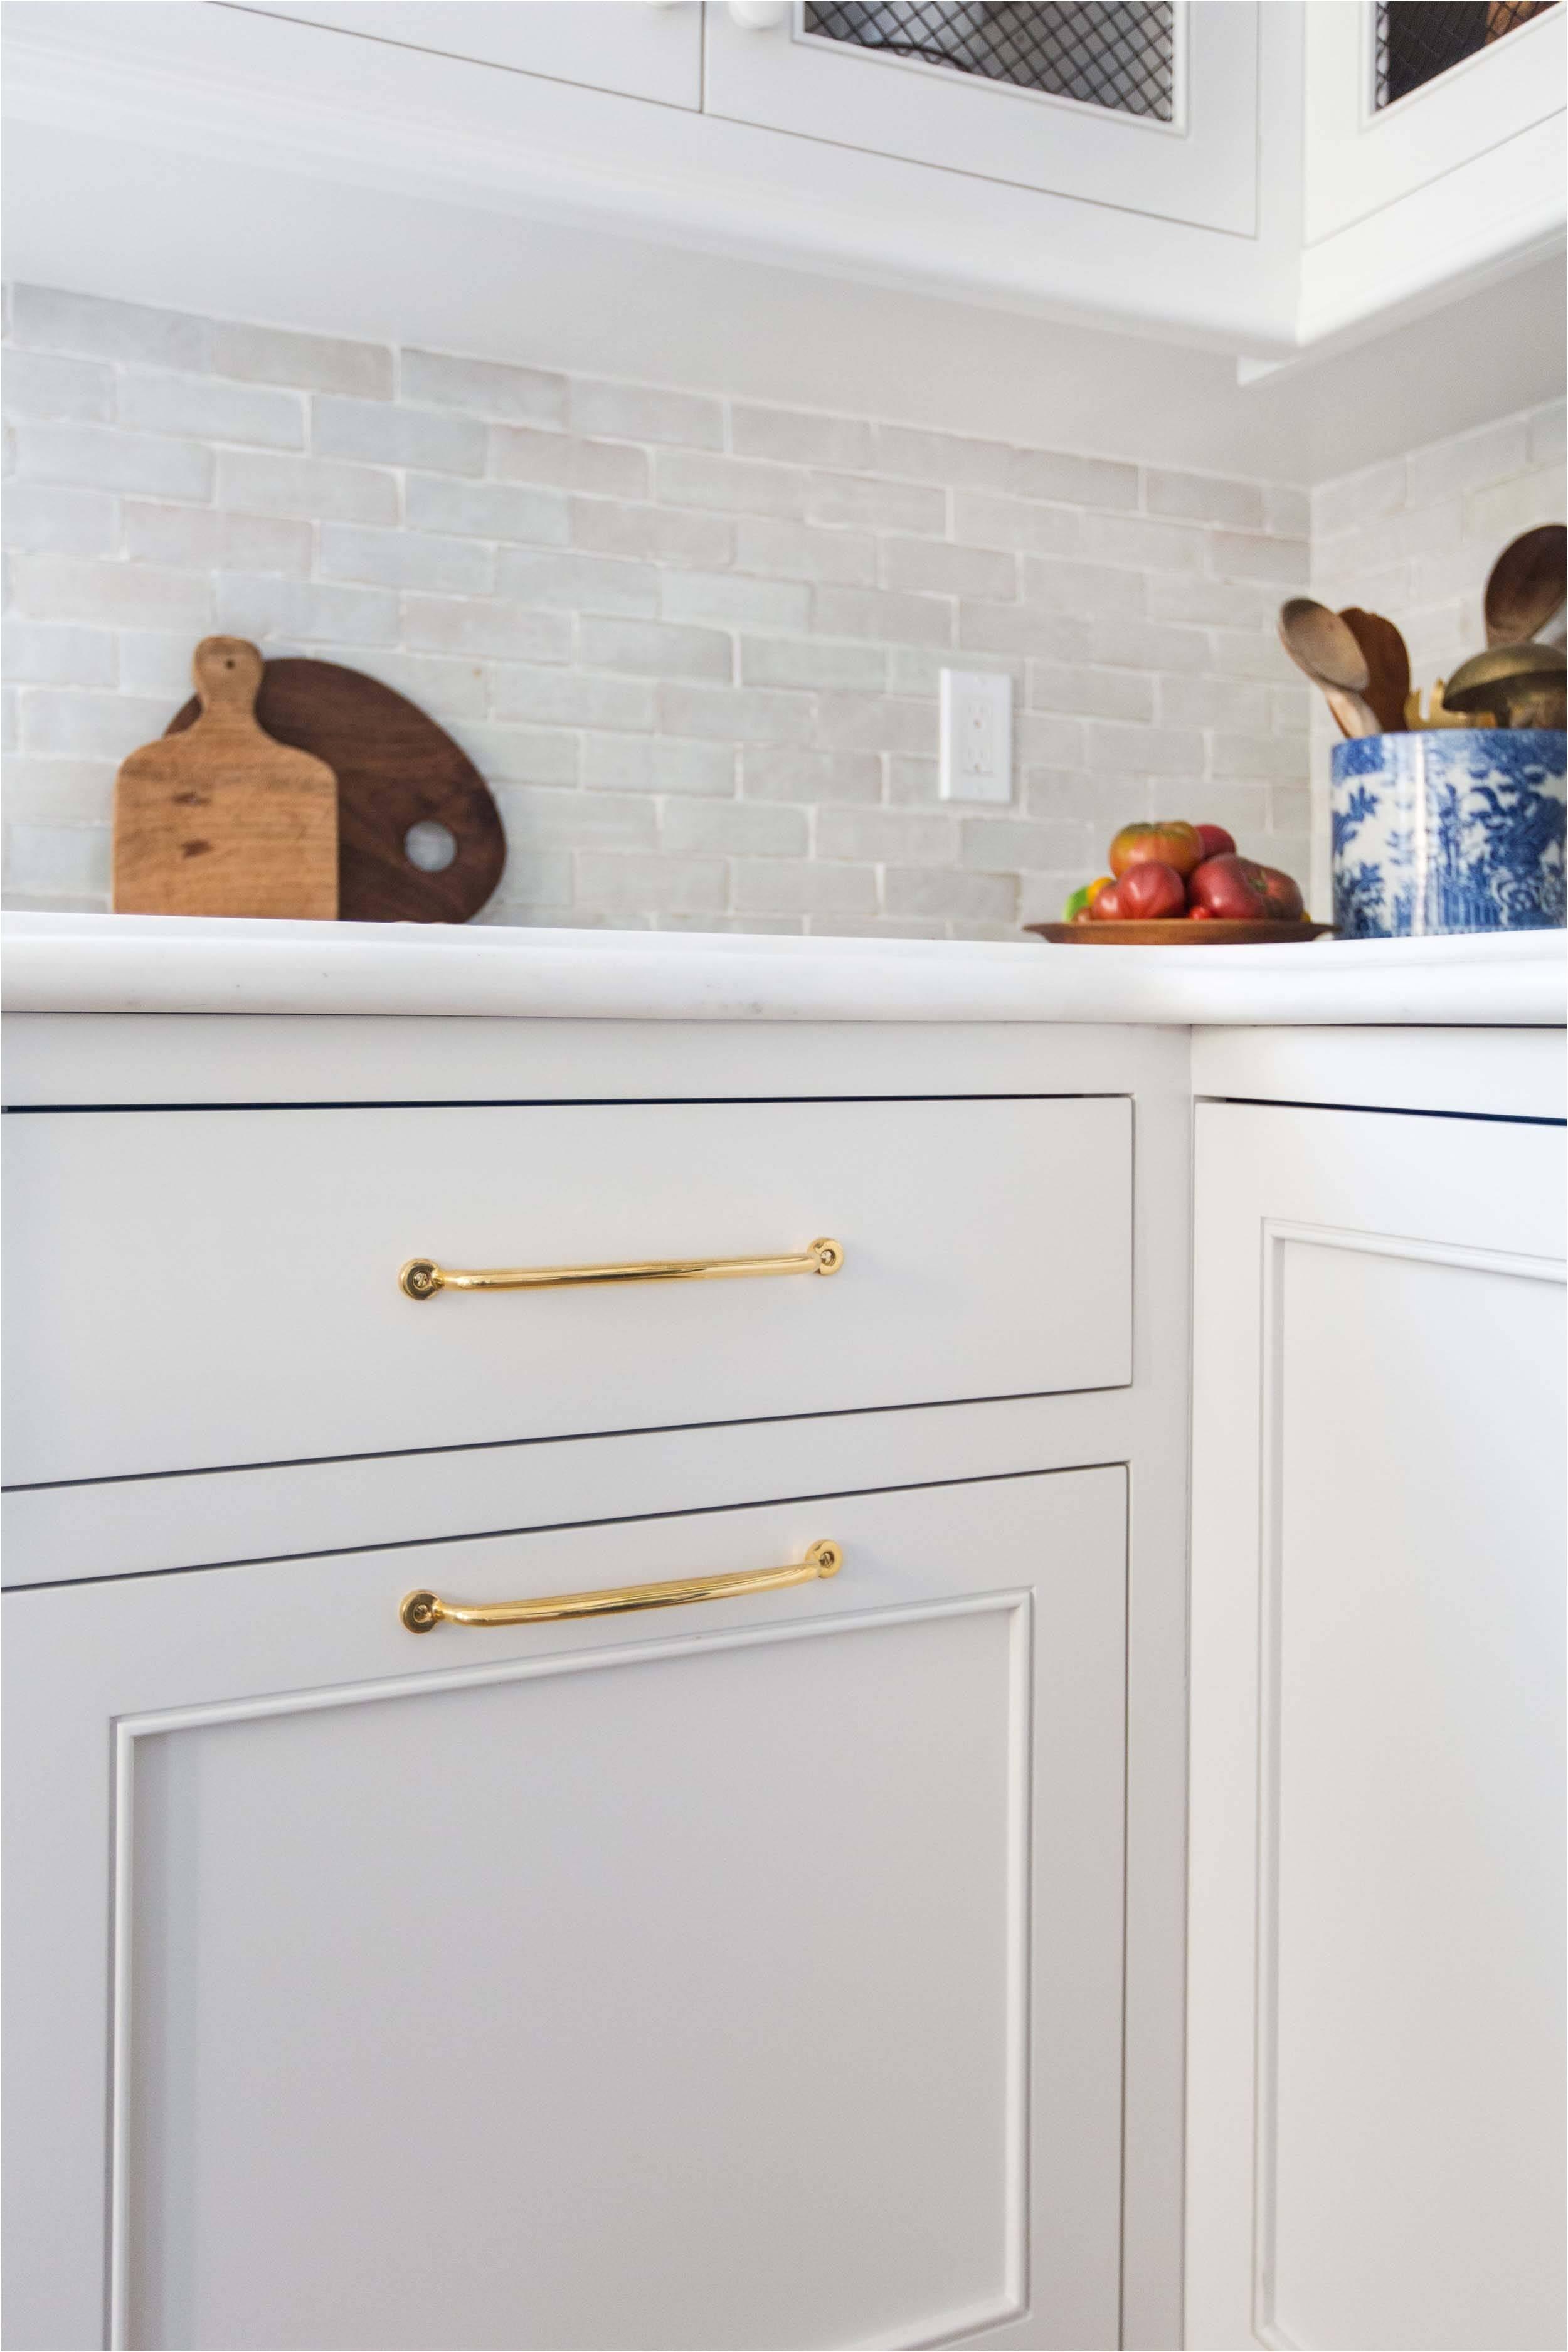 emily henderson full kitchen reveal waverly frigidaire 421